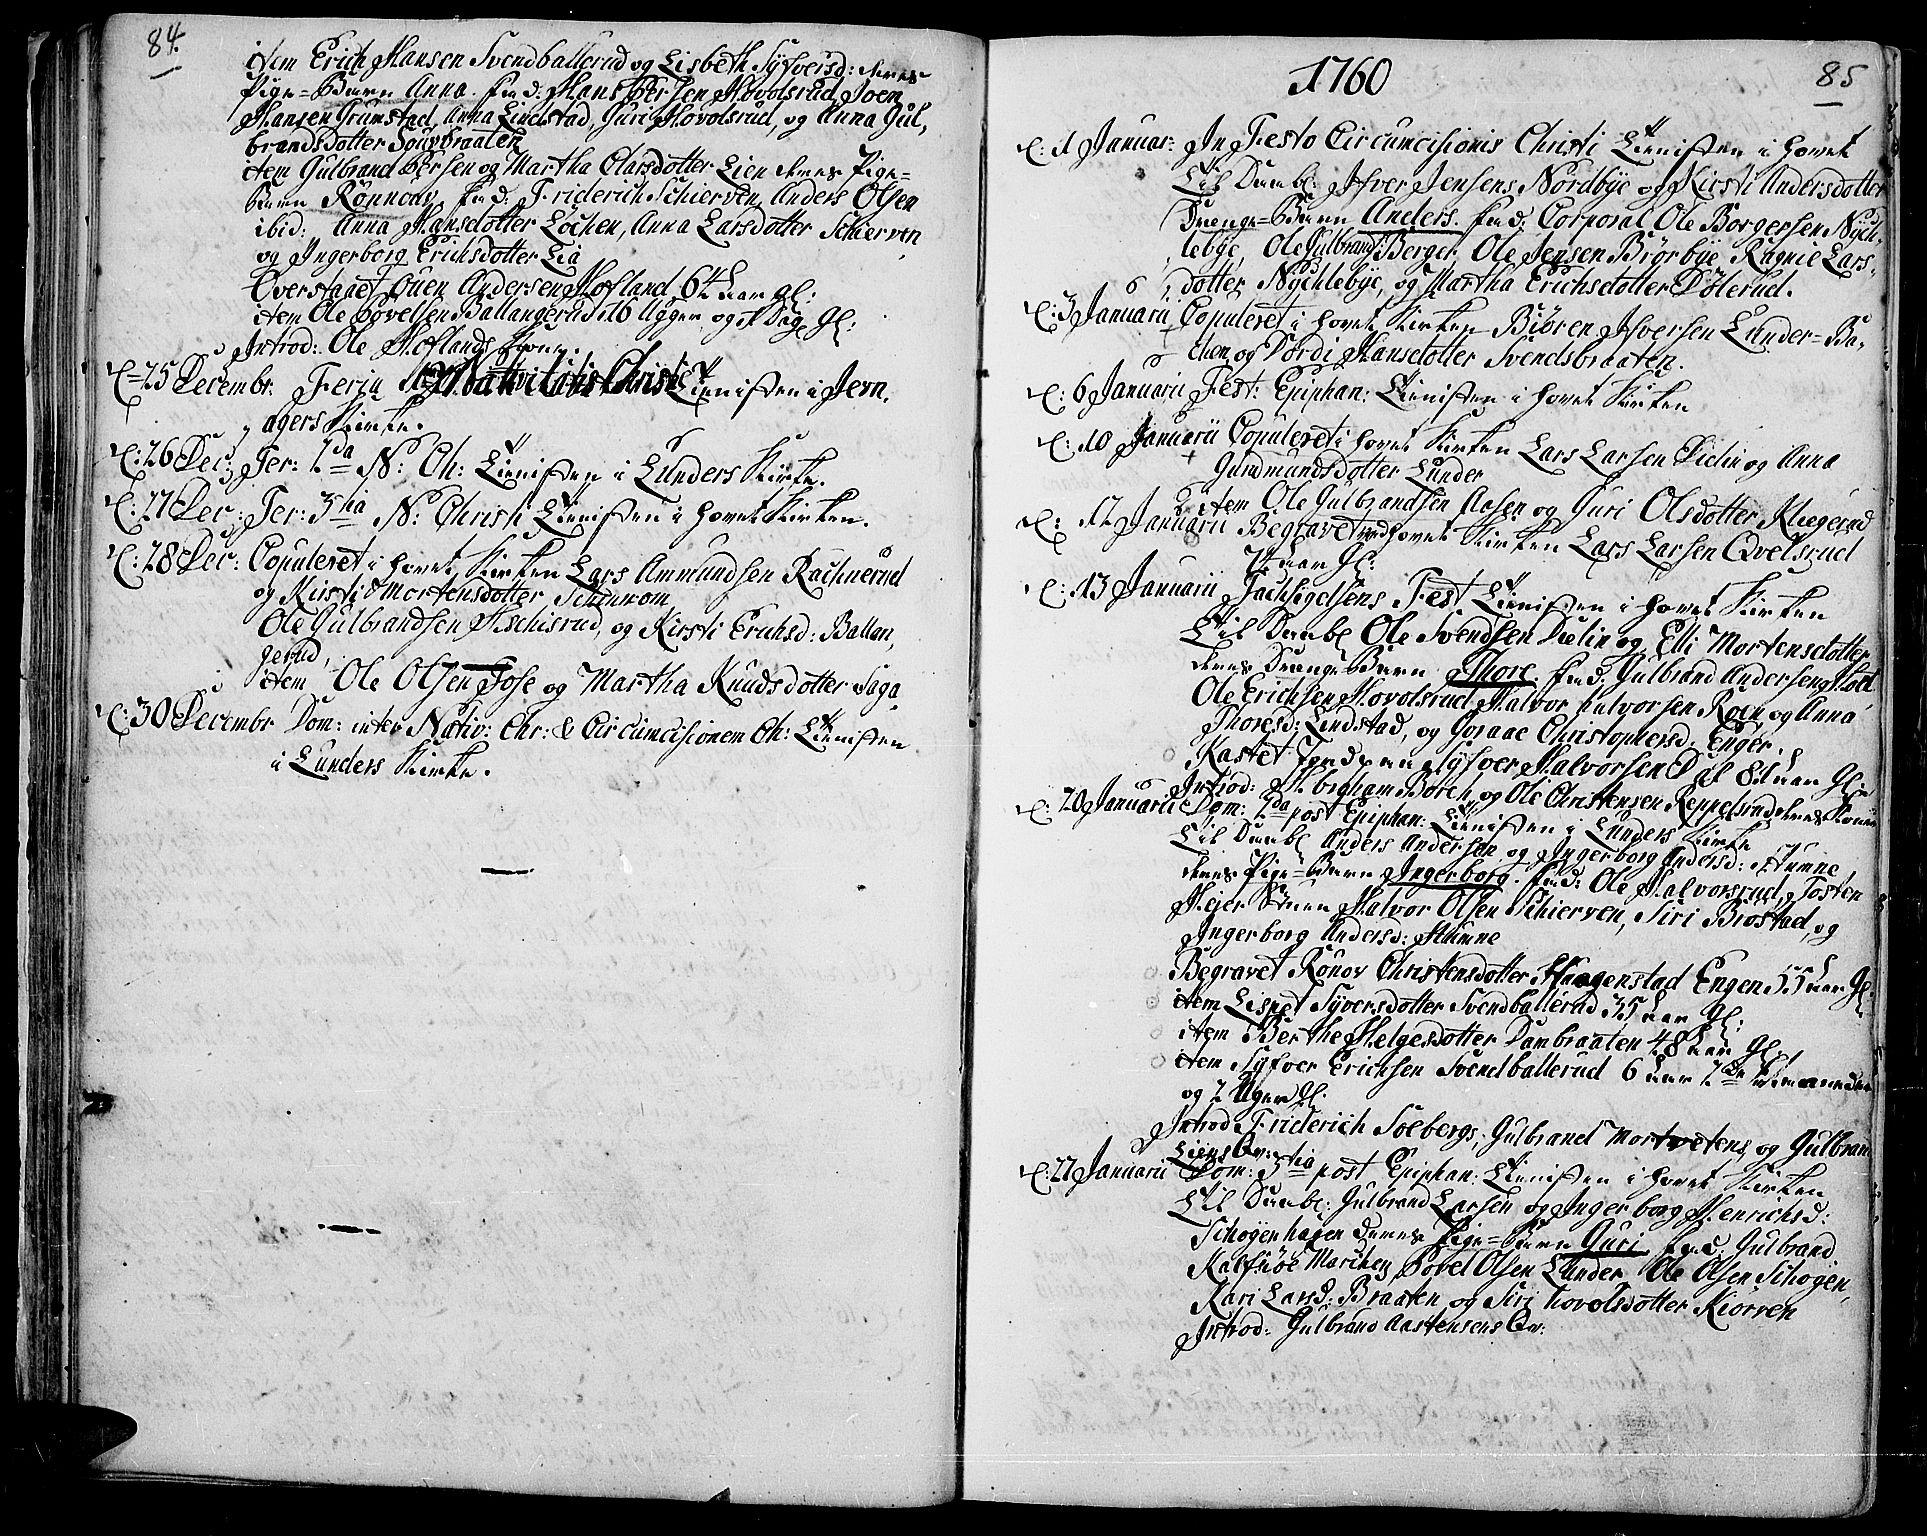 SAH, Jevnaker prestekontor, Ministerialbok nr. 3, 1752-1799, s. 84-85